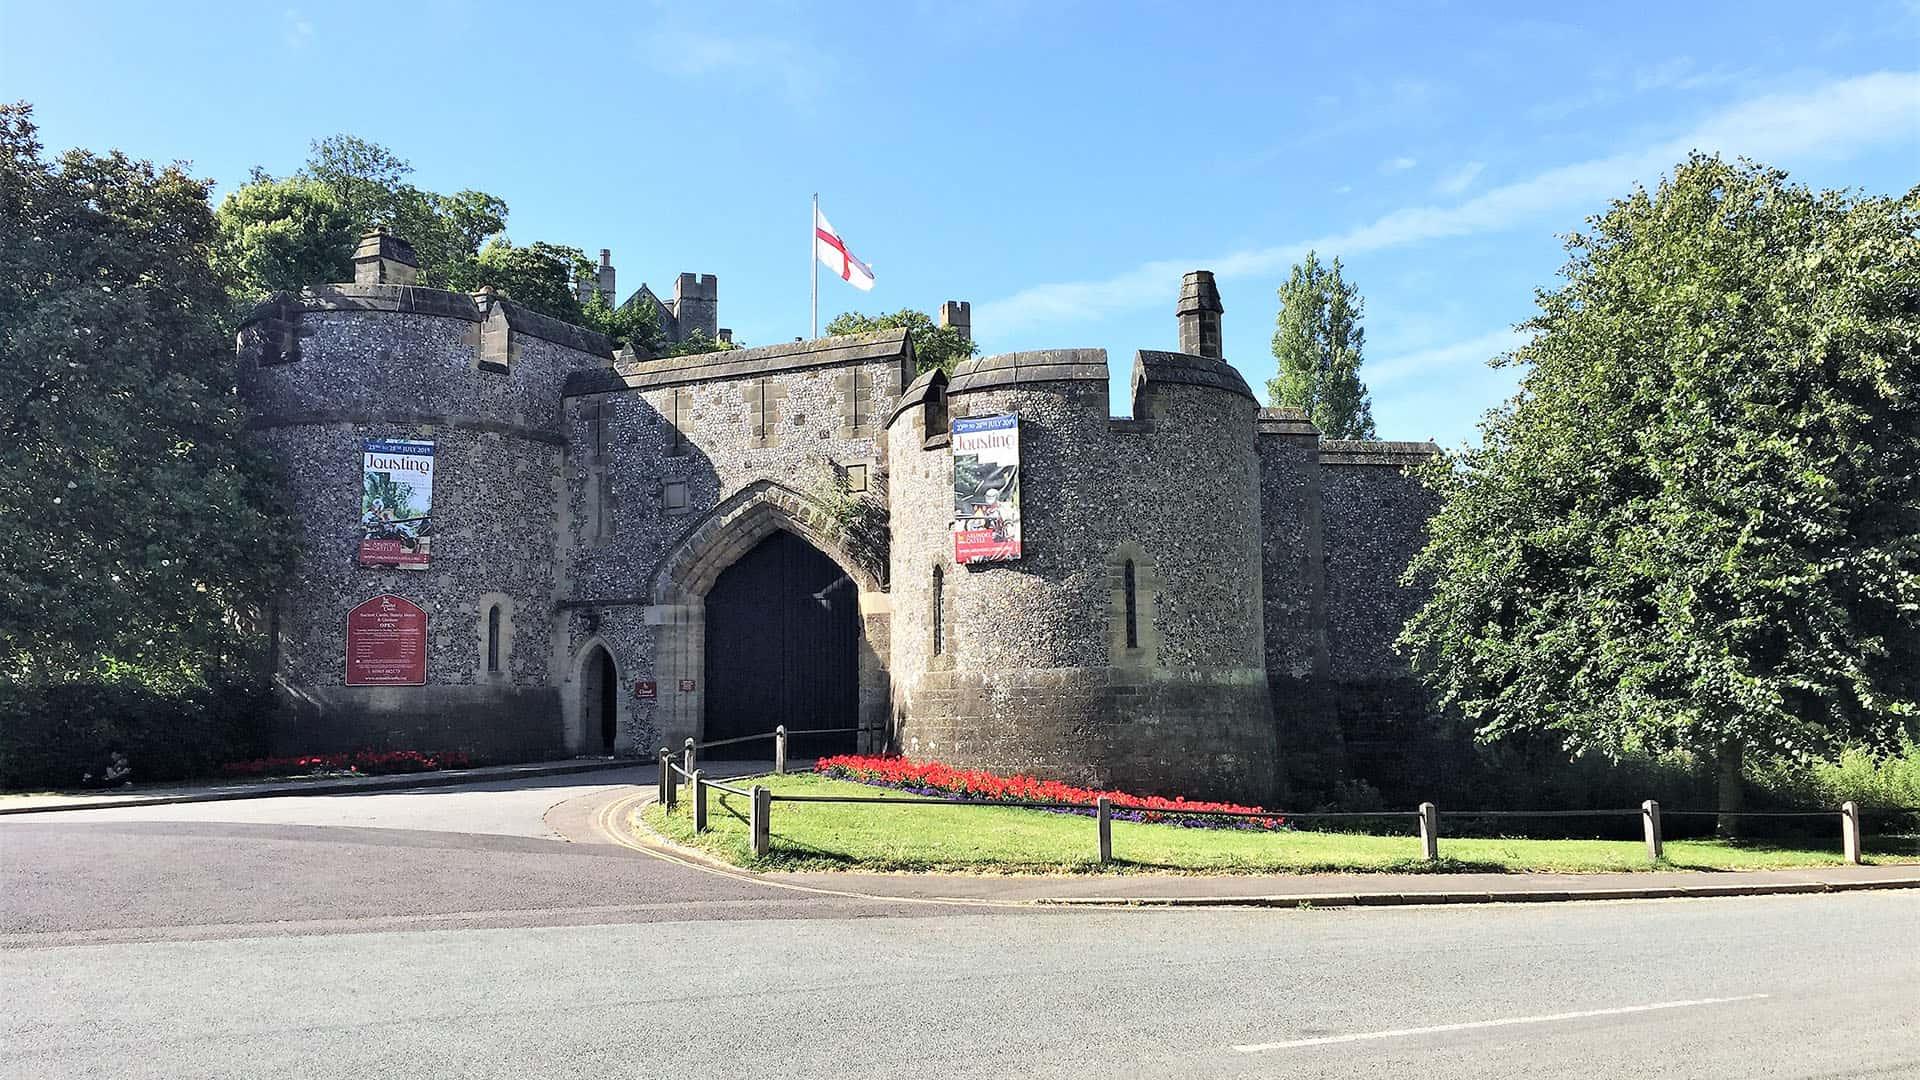 Arundel Castle Gate